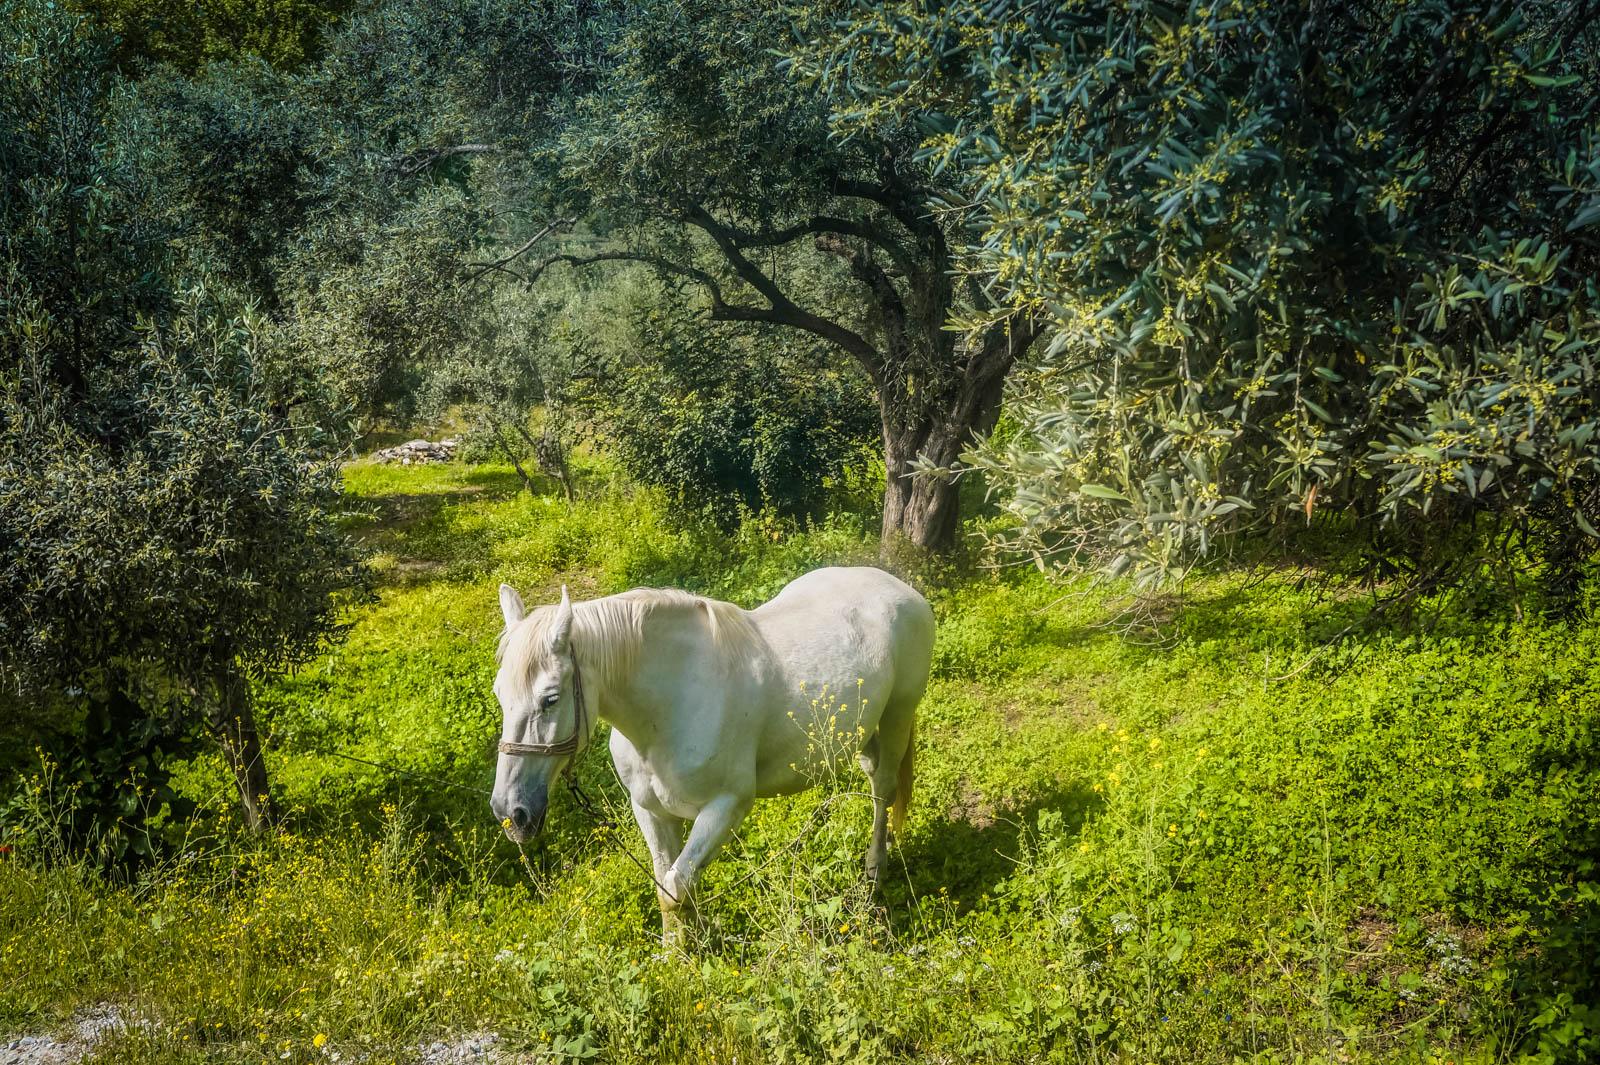 horseback-riding-pelion-greece-la-vie-en-blog-all-rights-reserved-11